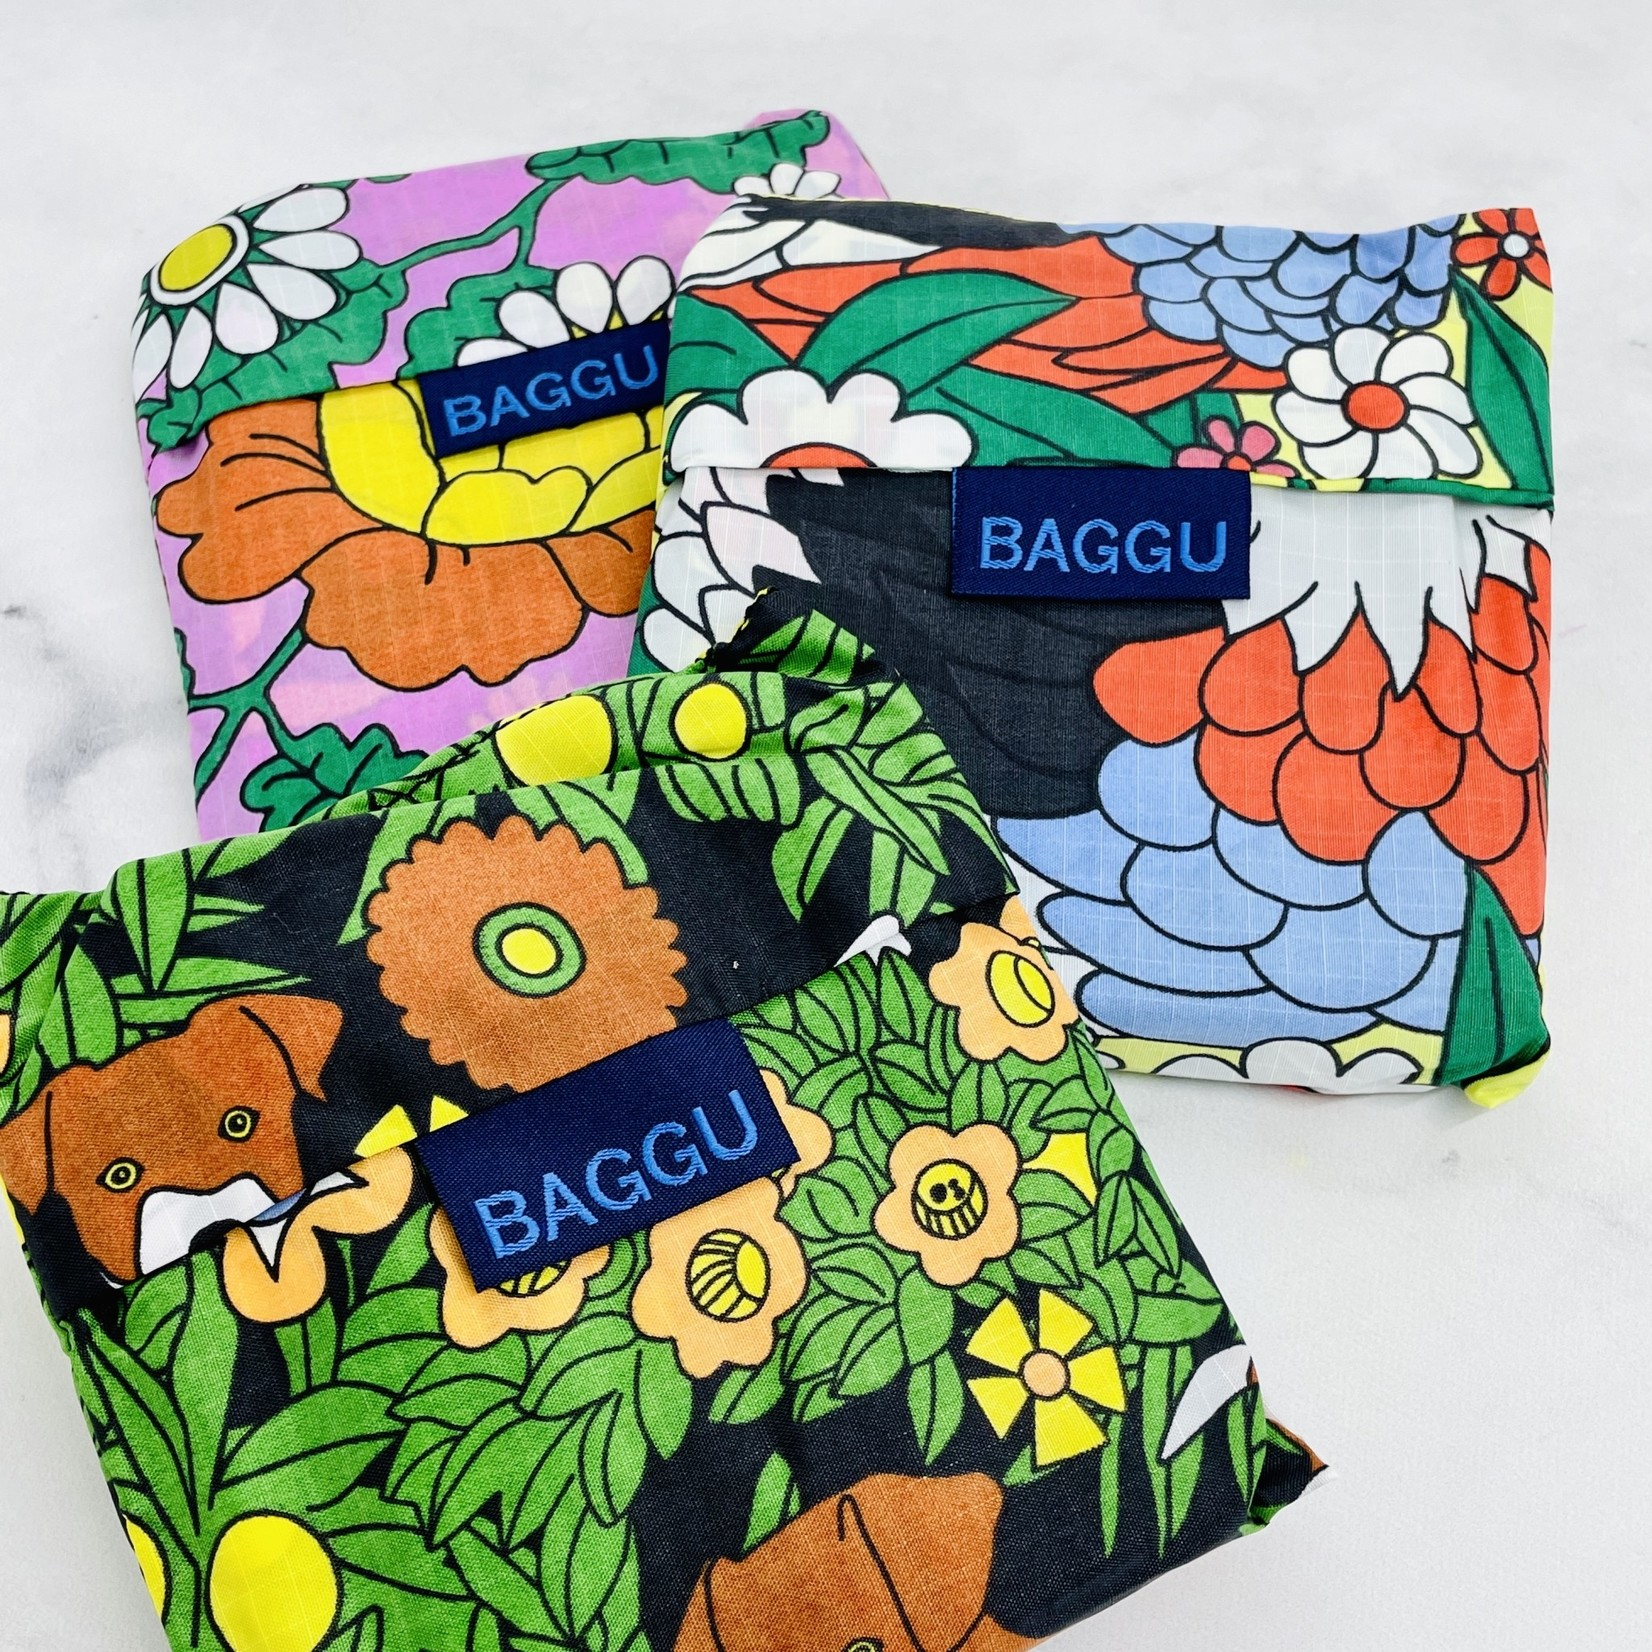 Standard Baggu